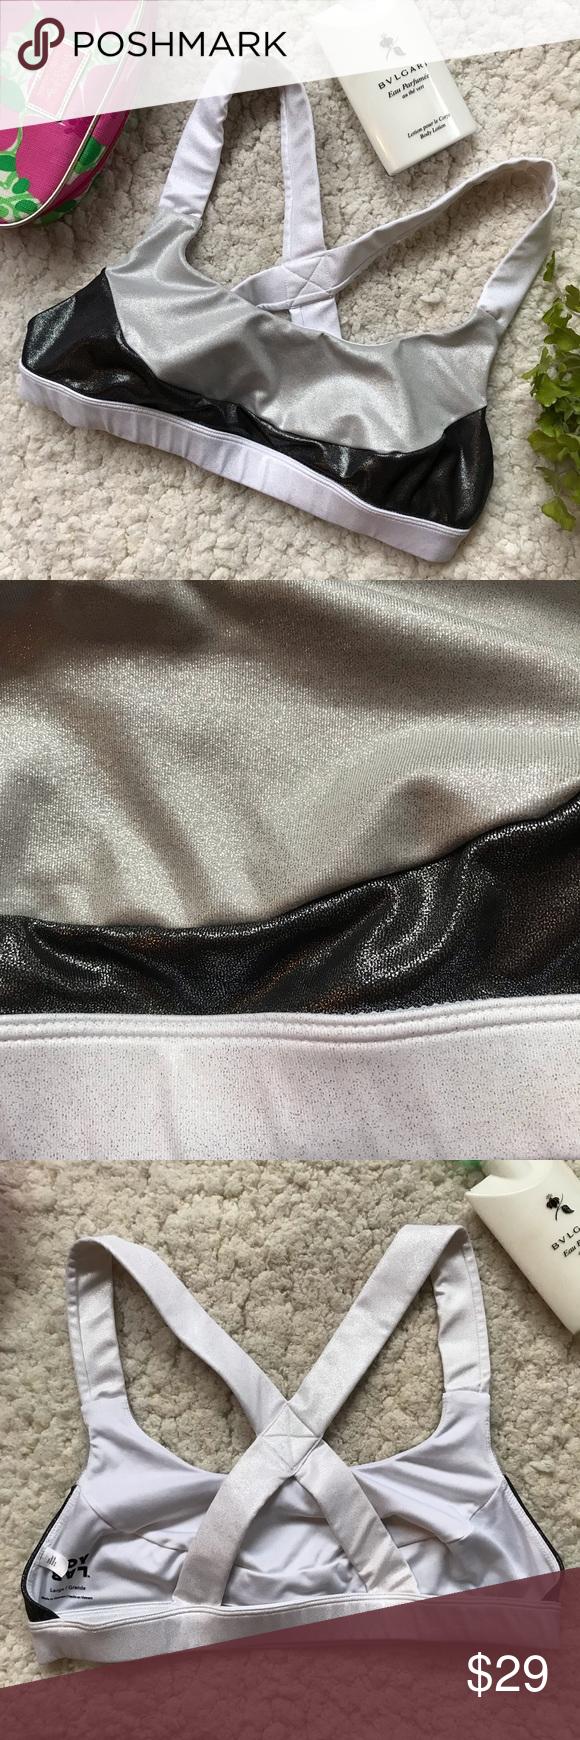 36a797d68e JOY LAB EUC. Joy Lab Intimates   Sleepwear Bras